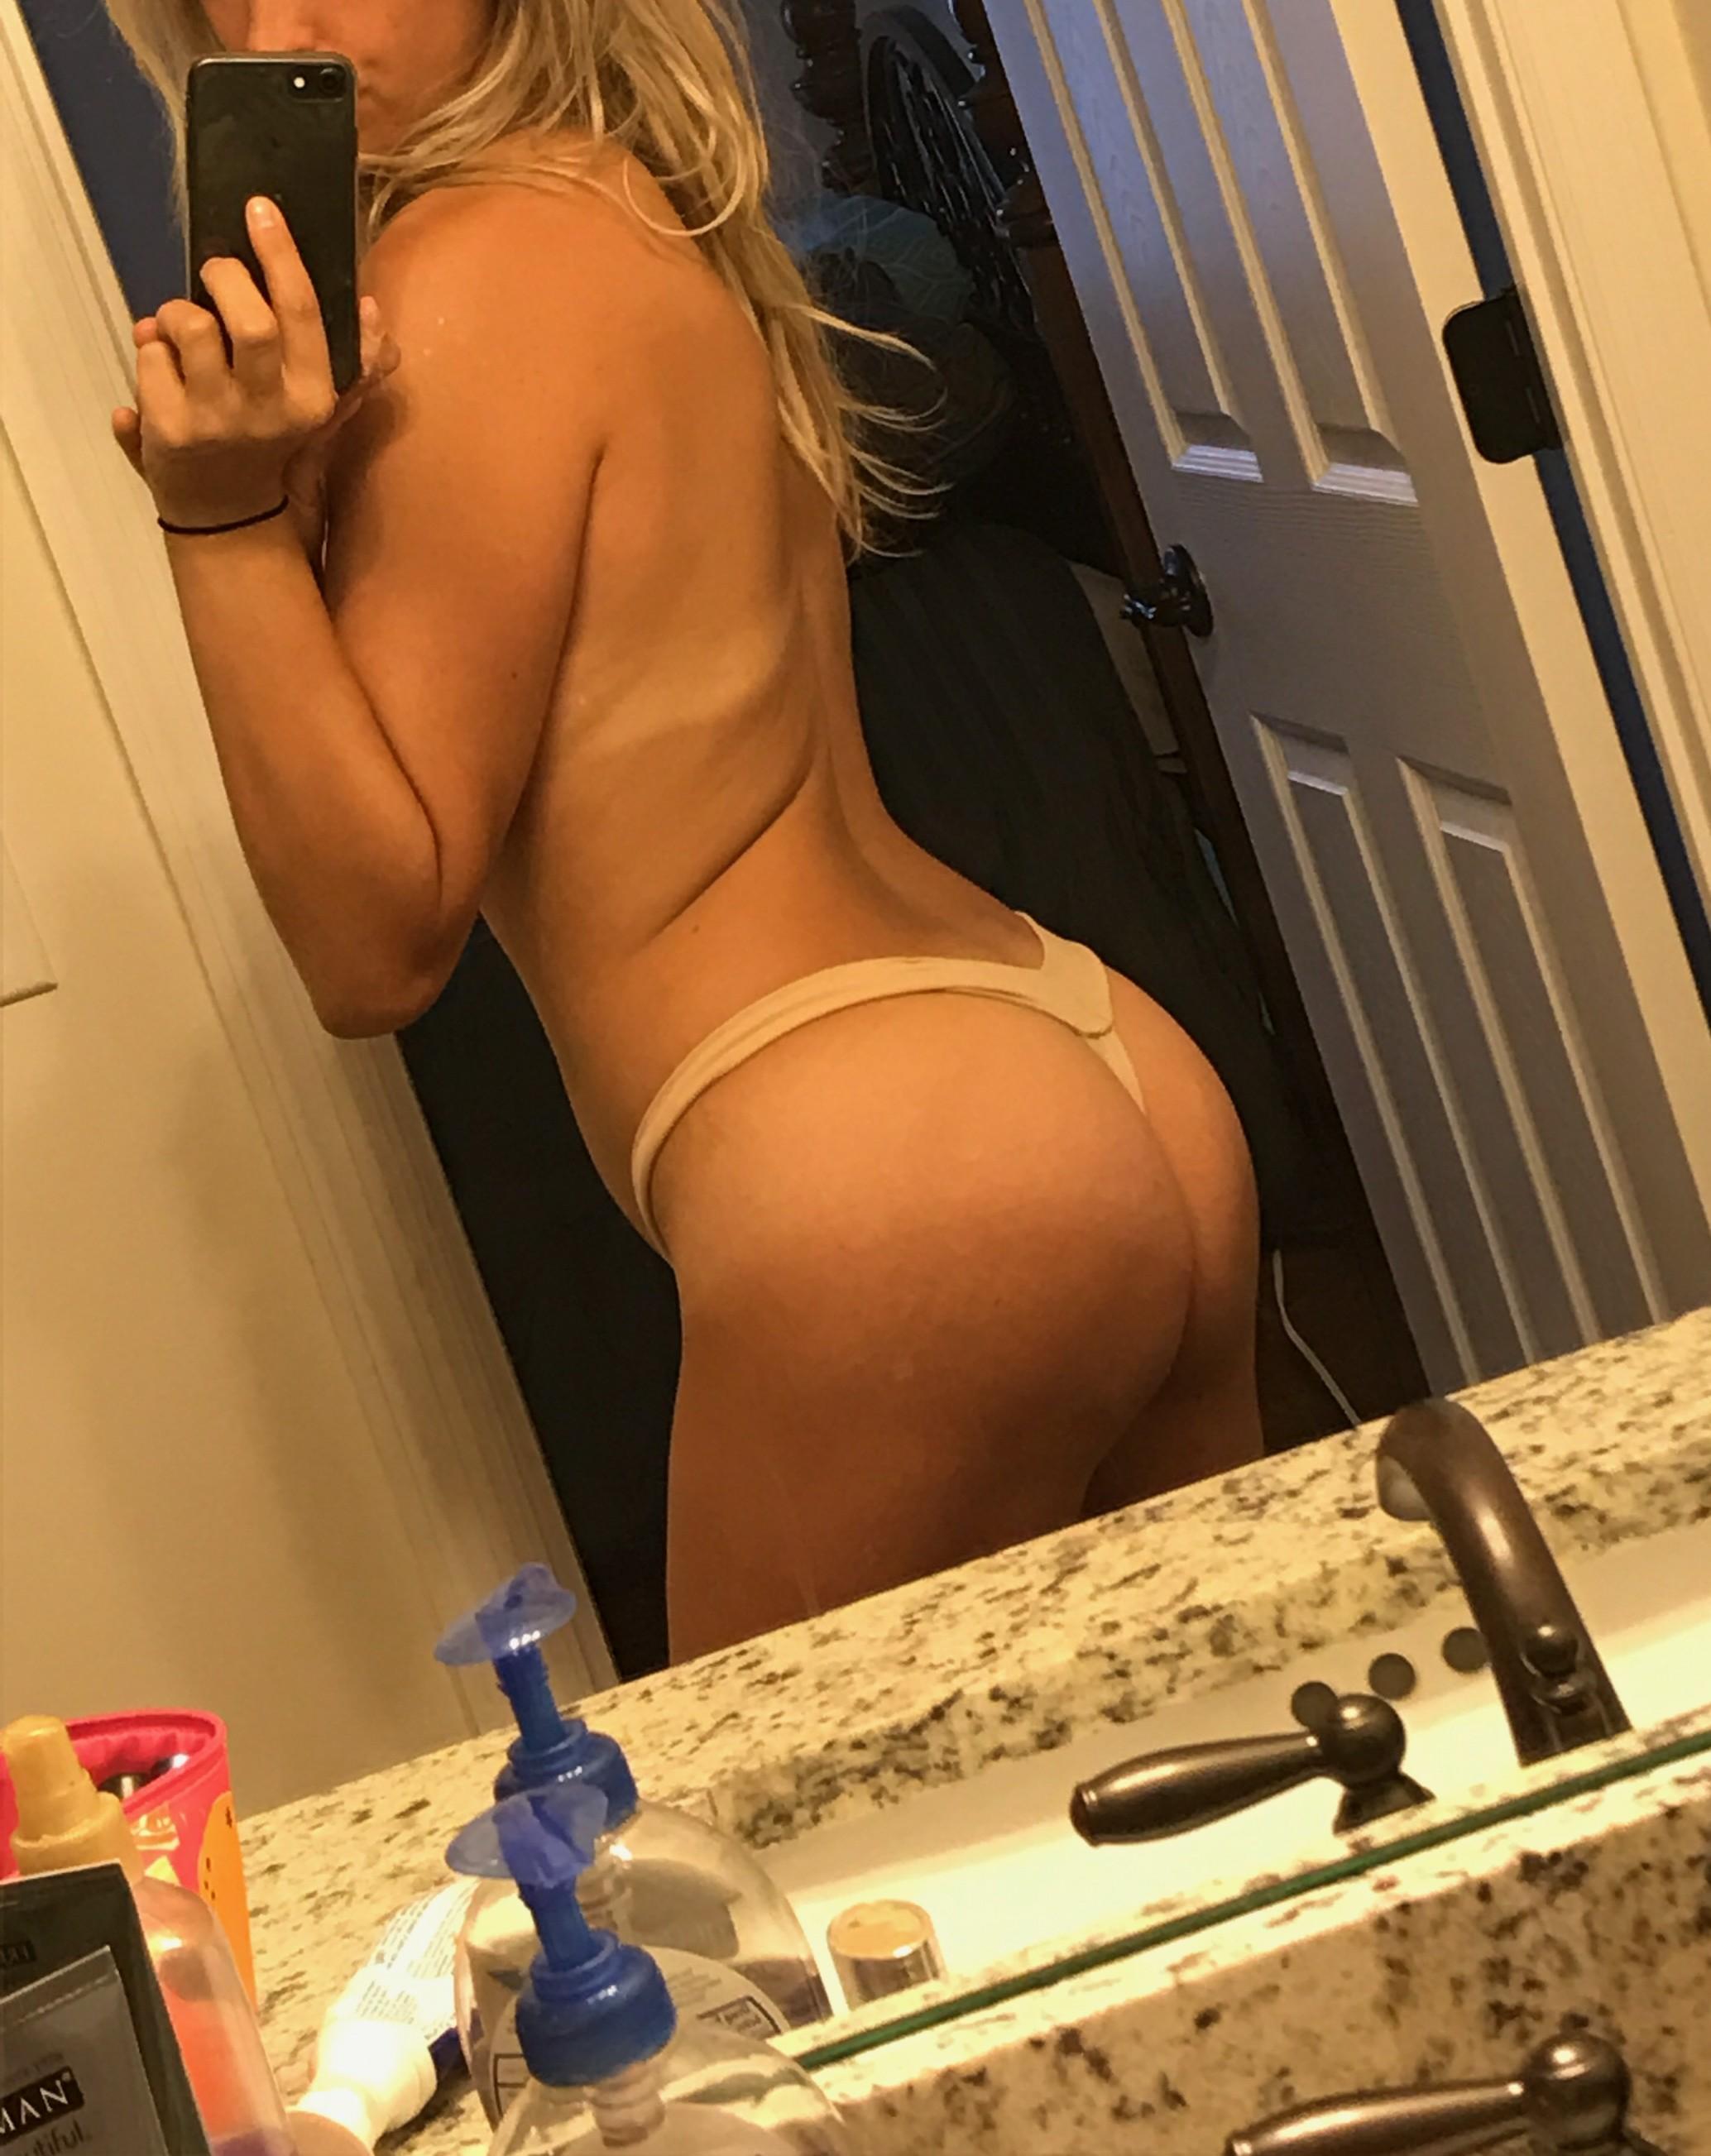 http://www.sextingpics.com/wp-content/uploads/2017/05/img_3488.jpg